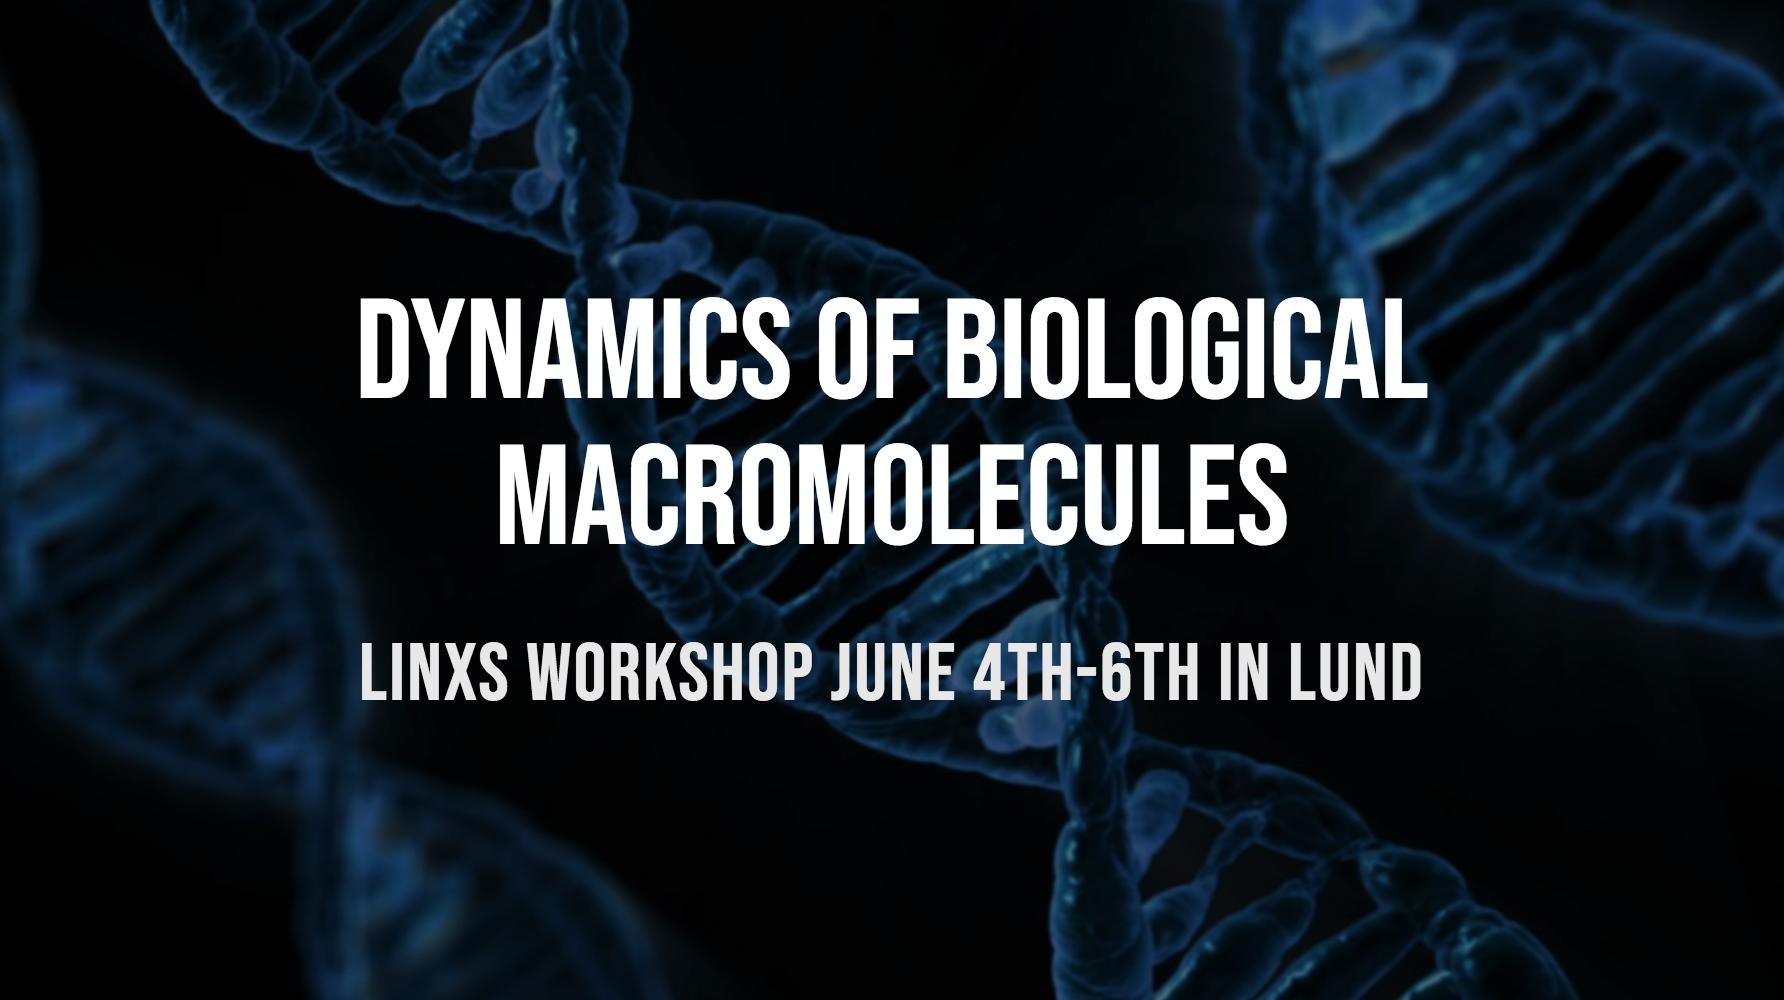 Dynamics of Biological Macromolecules